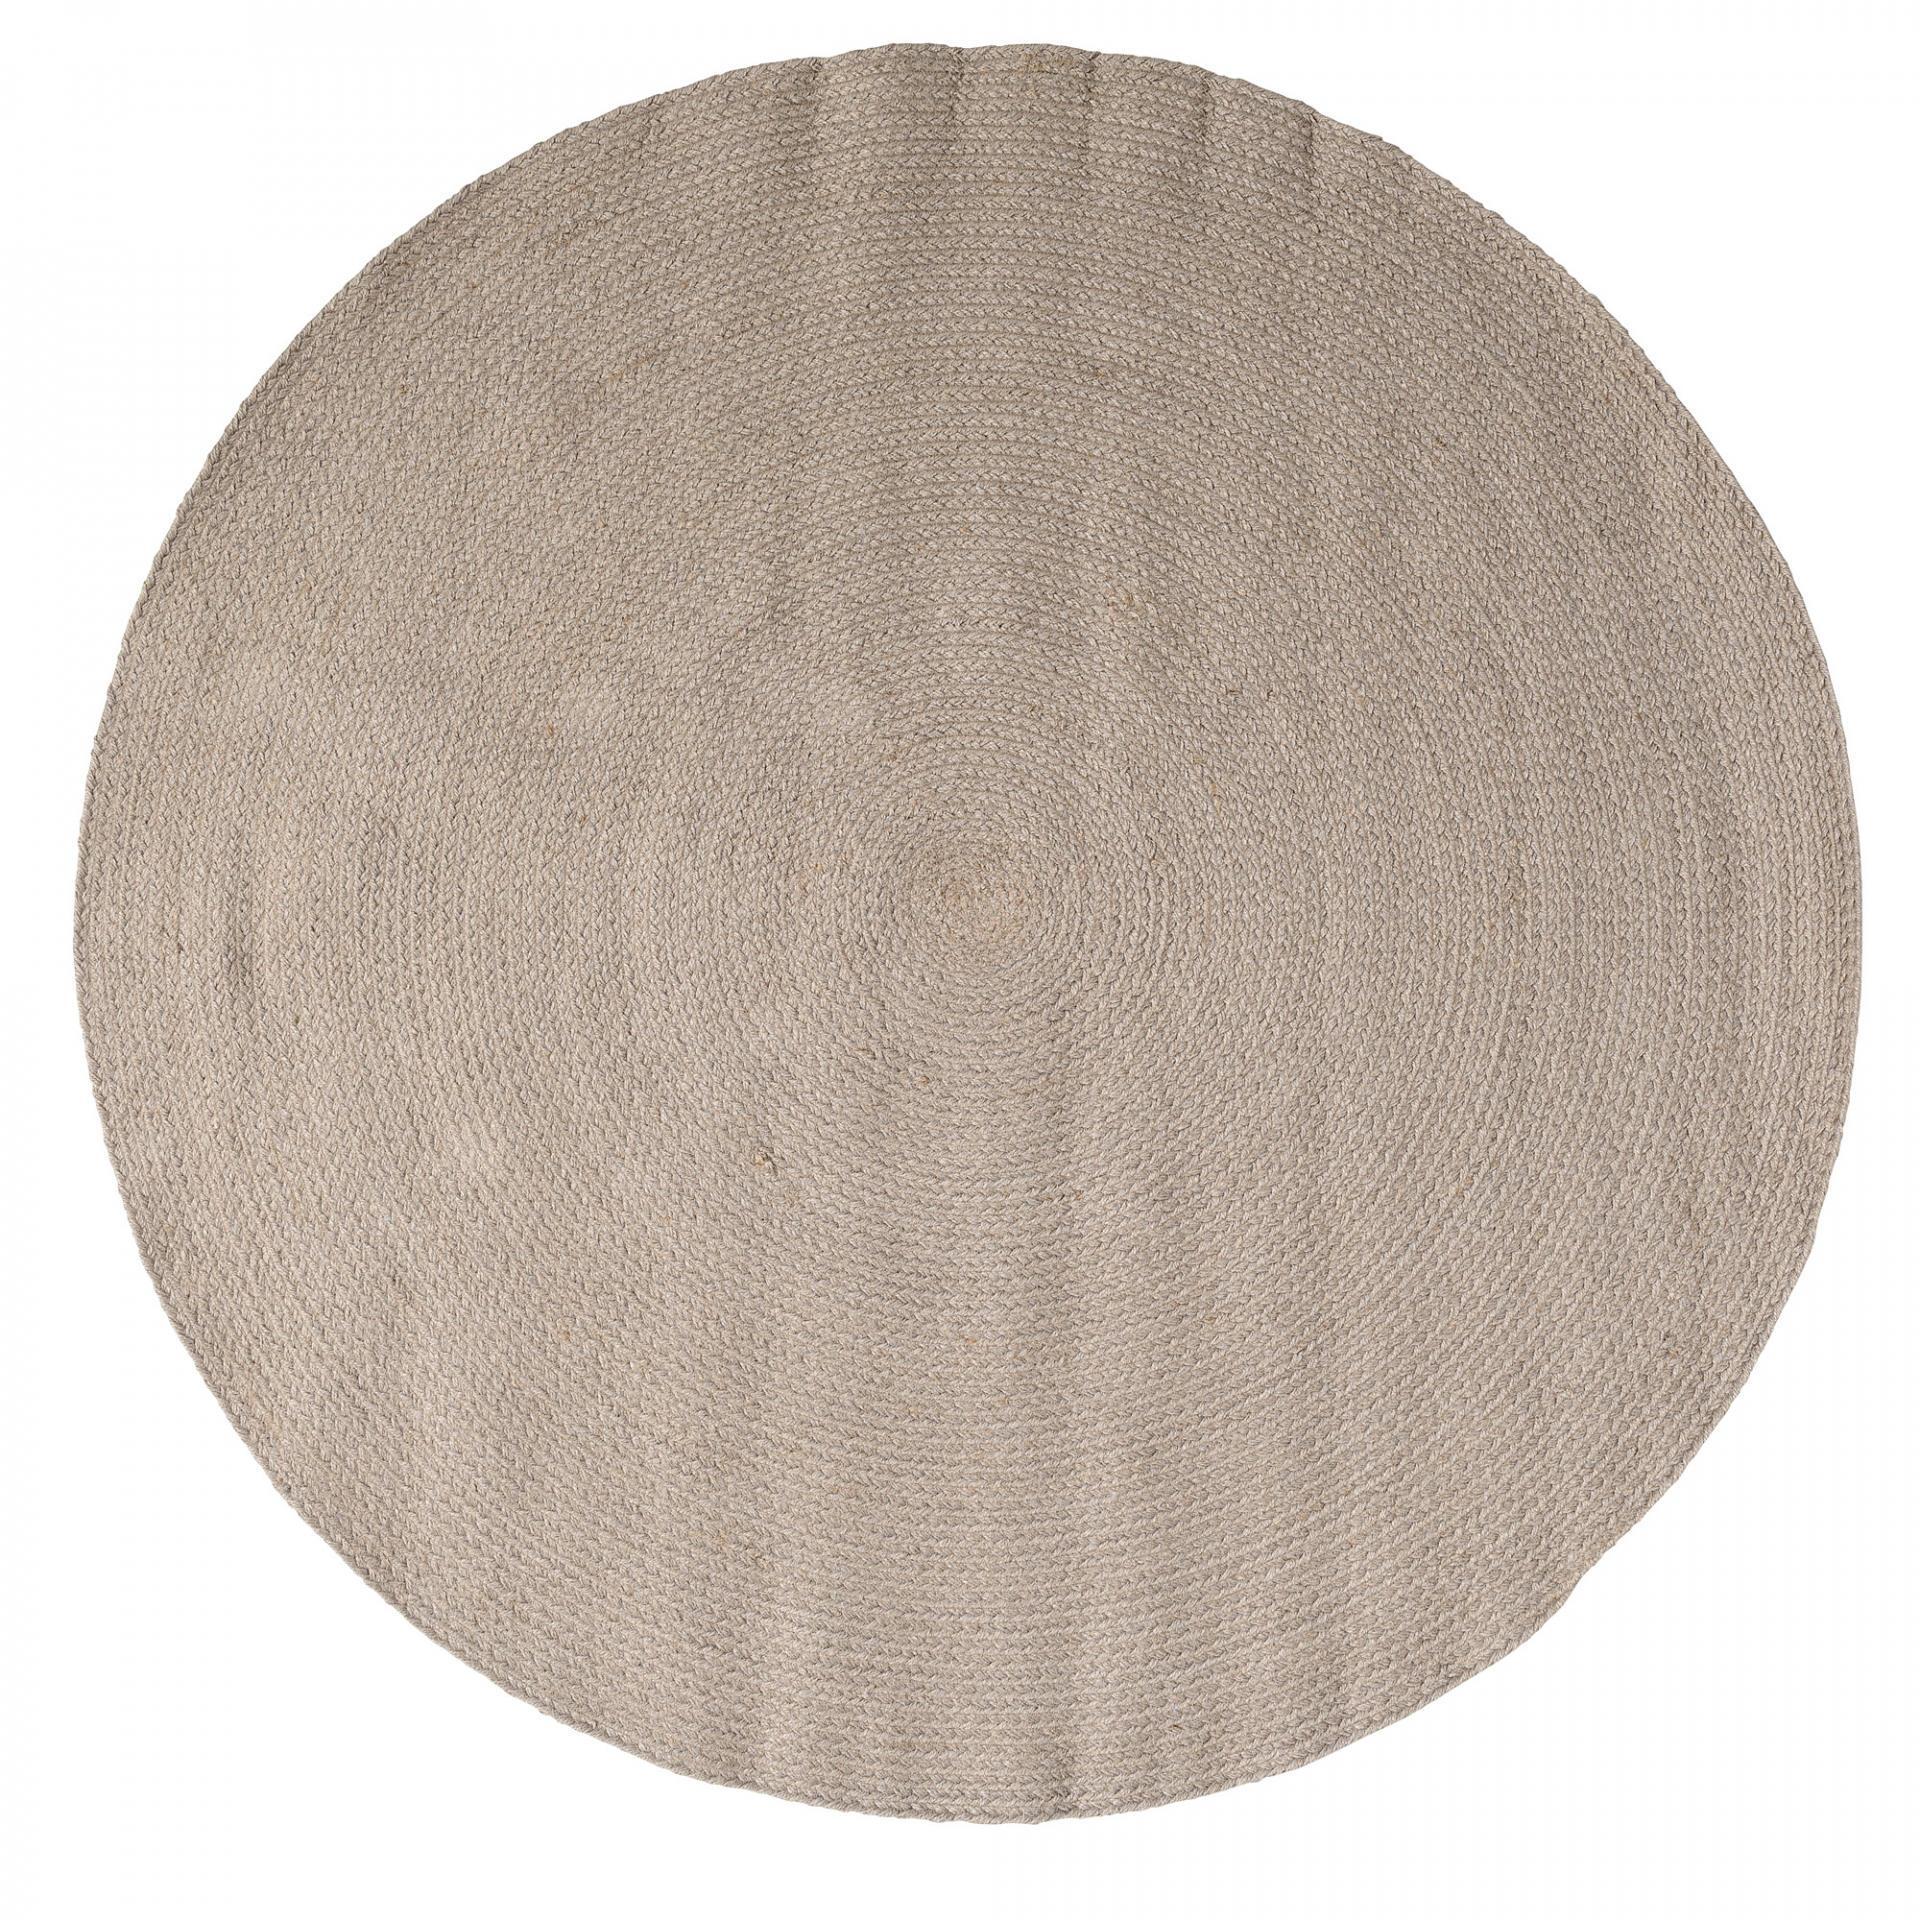 Bloomingville Jutový kobereček Stone - 120cm, šedá barva, hnědá barva, textil Hnědá